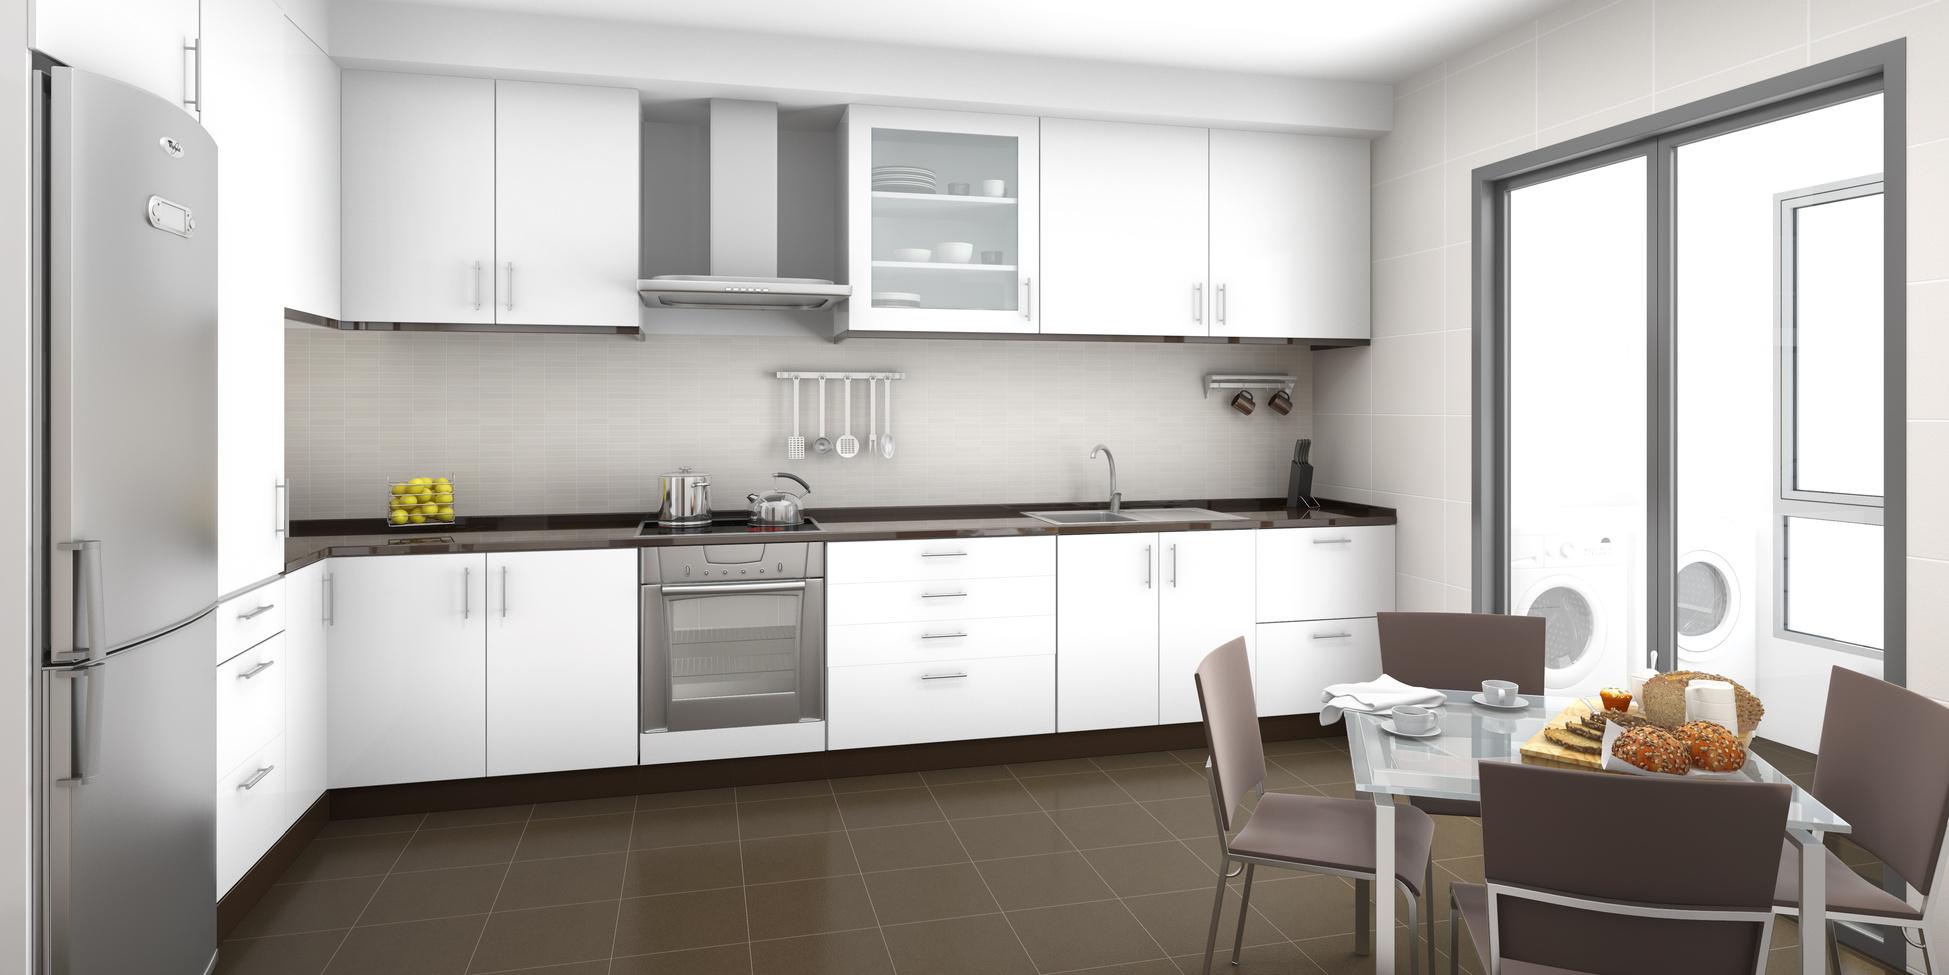 K for Diversi design per la casa